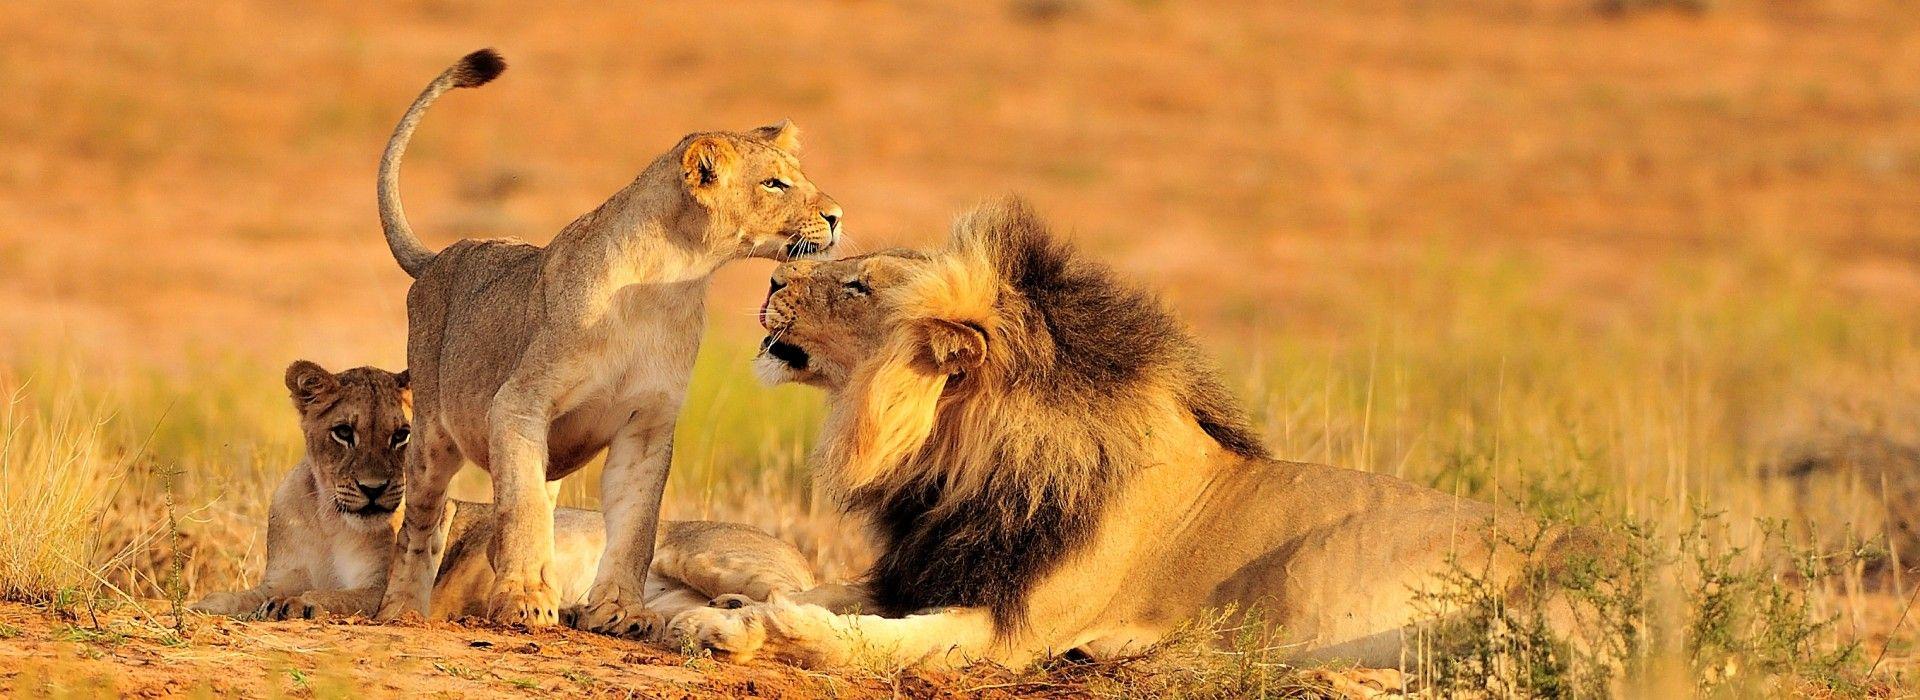 Wildlife safaris and game drives Tours in Pilanesberg National Park